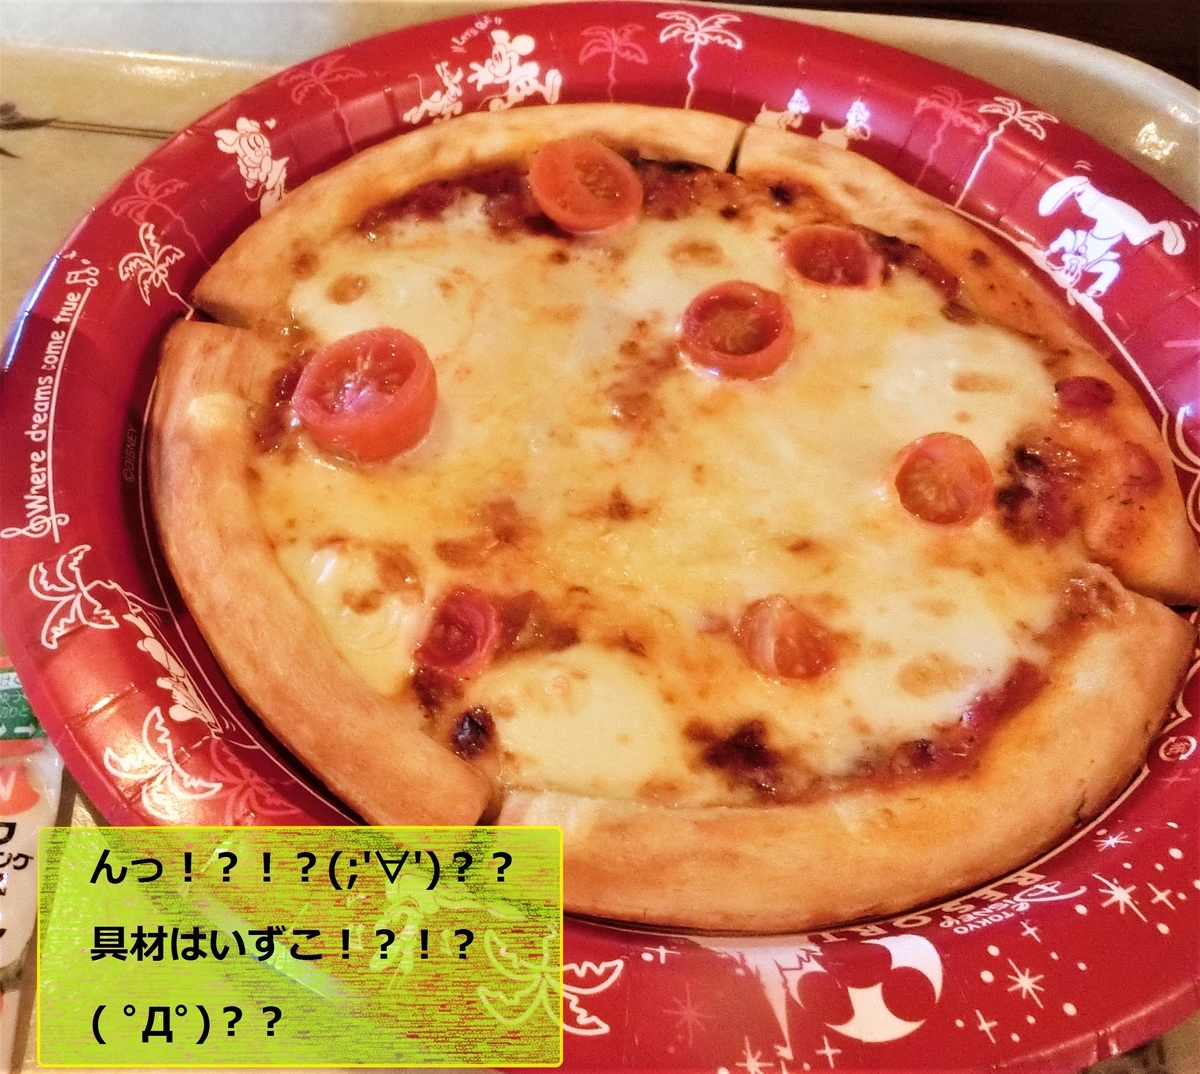 f:id:ichiko-disneyblog:20190828145532j:plain